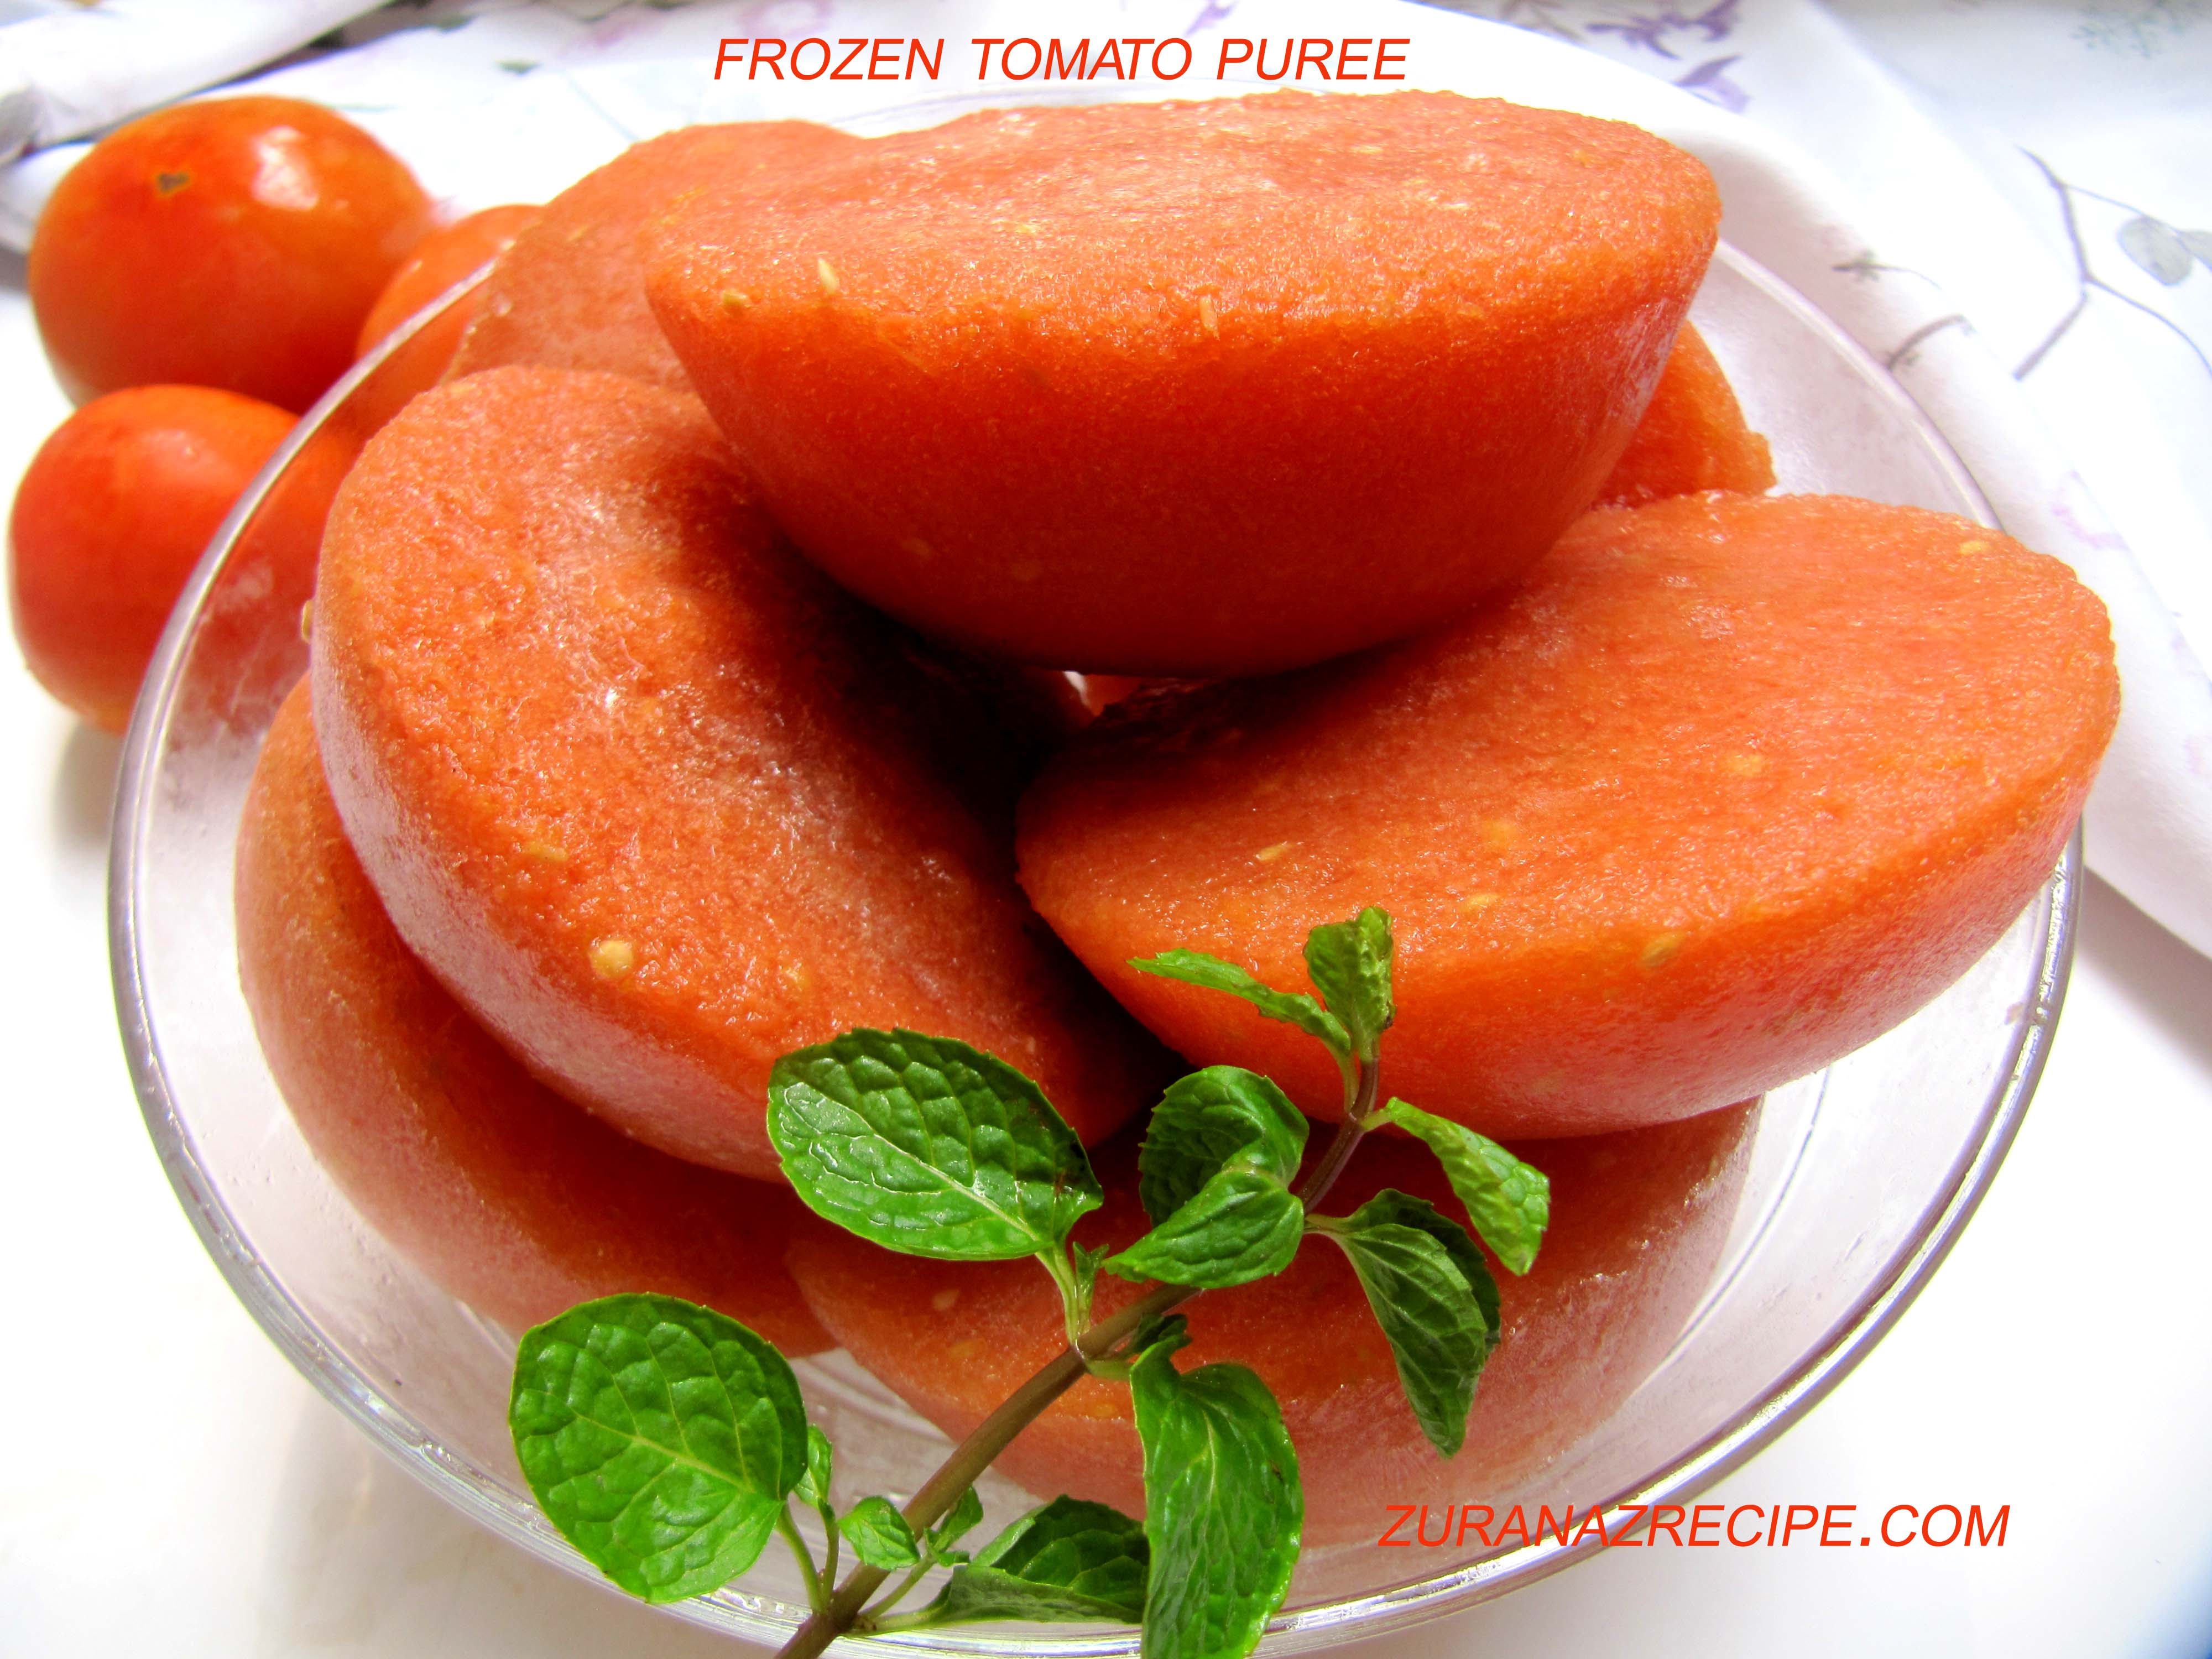 How to frozen tomato puree/How to preserve tomato puree